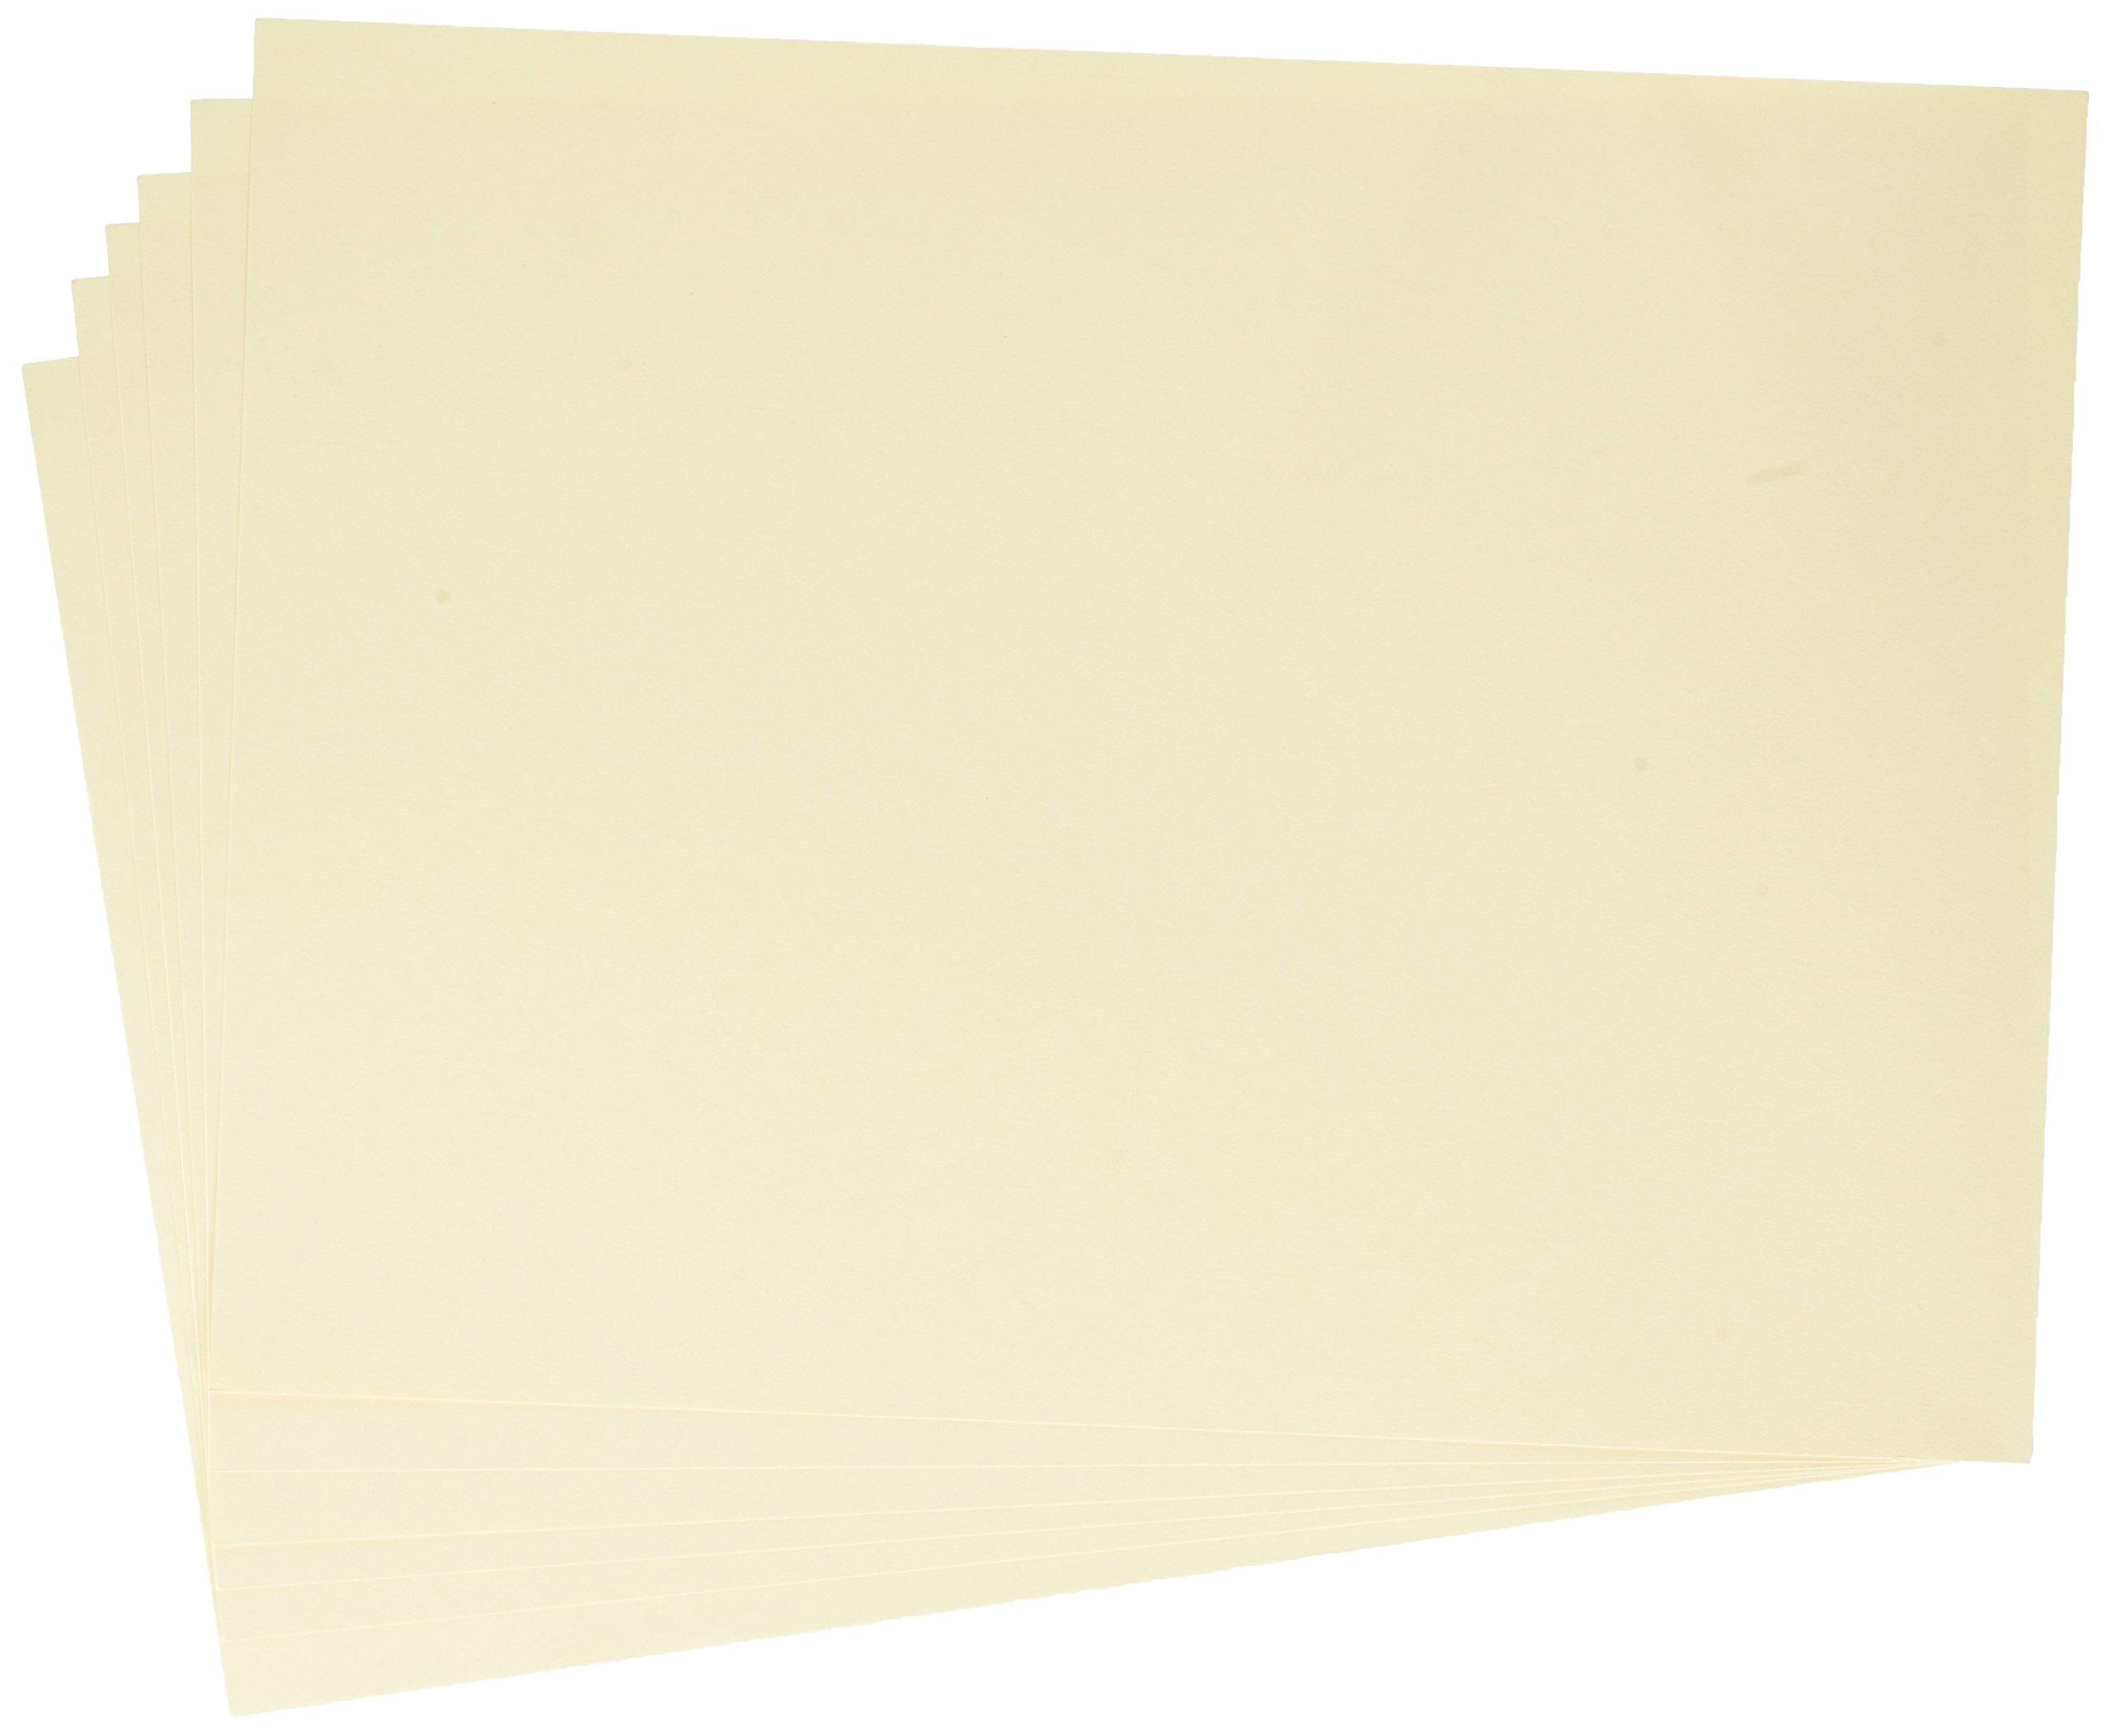 School Smart Tagboard - Medium Weight - 9 x 12 - 100 Sheets - Manila